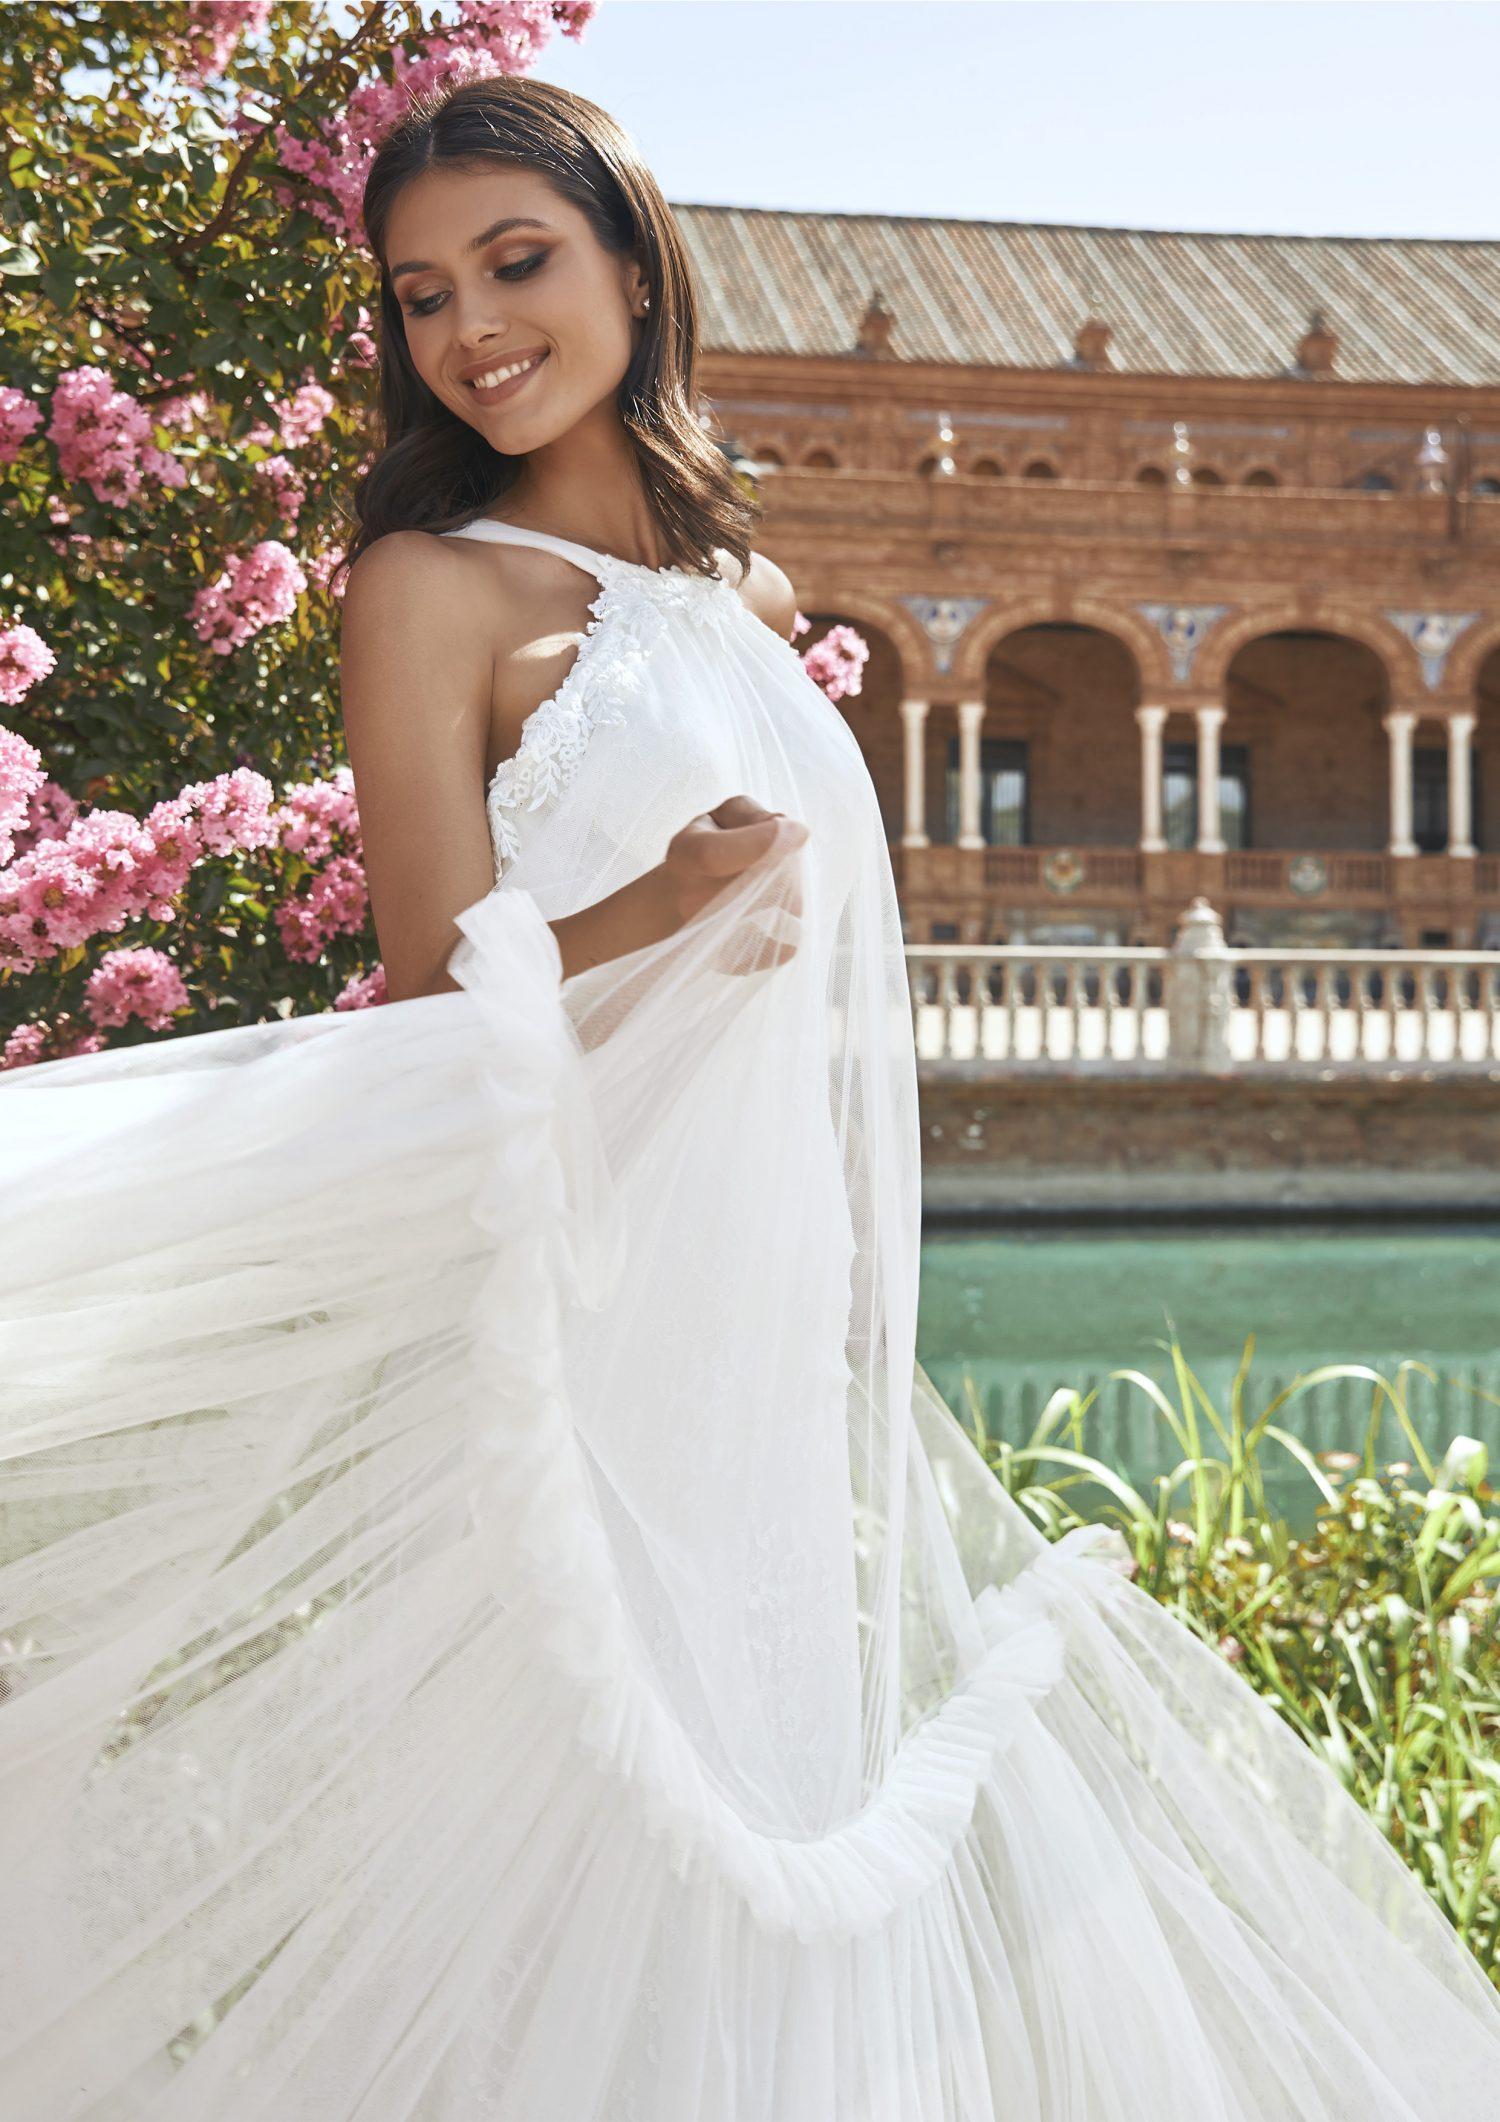 Pronovias vestidos de Novia 2021 Marchesa 72 1 - Marchesa la Nueva Colección de Vestidos de Novia Pronovias 2021